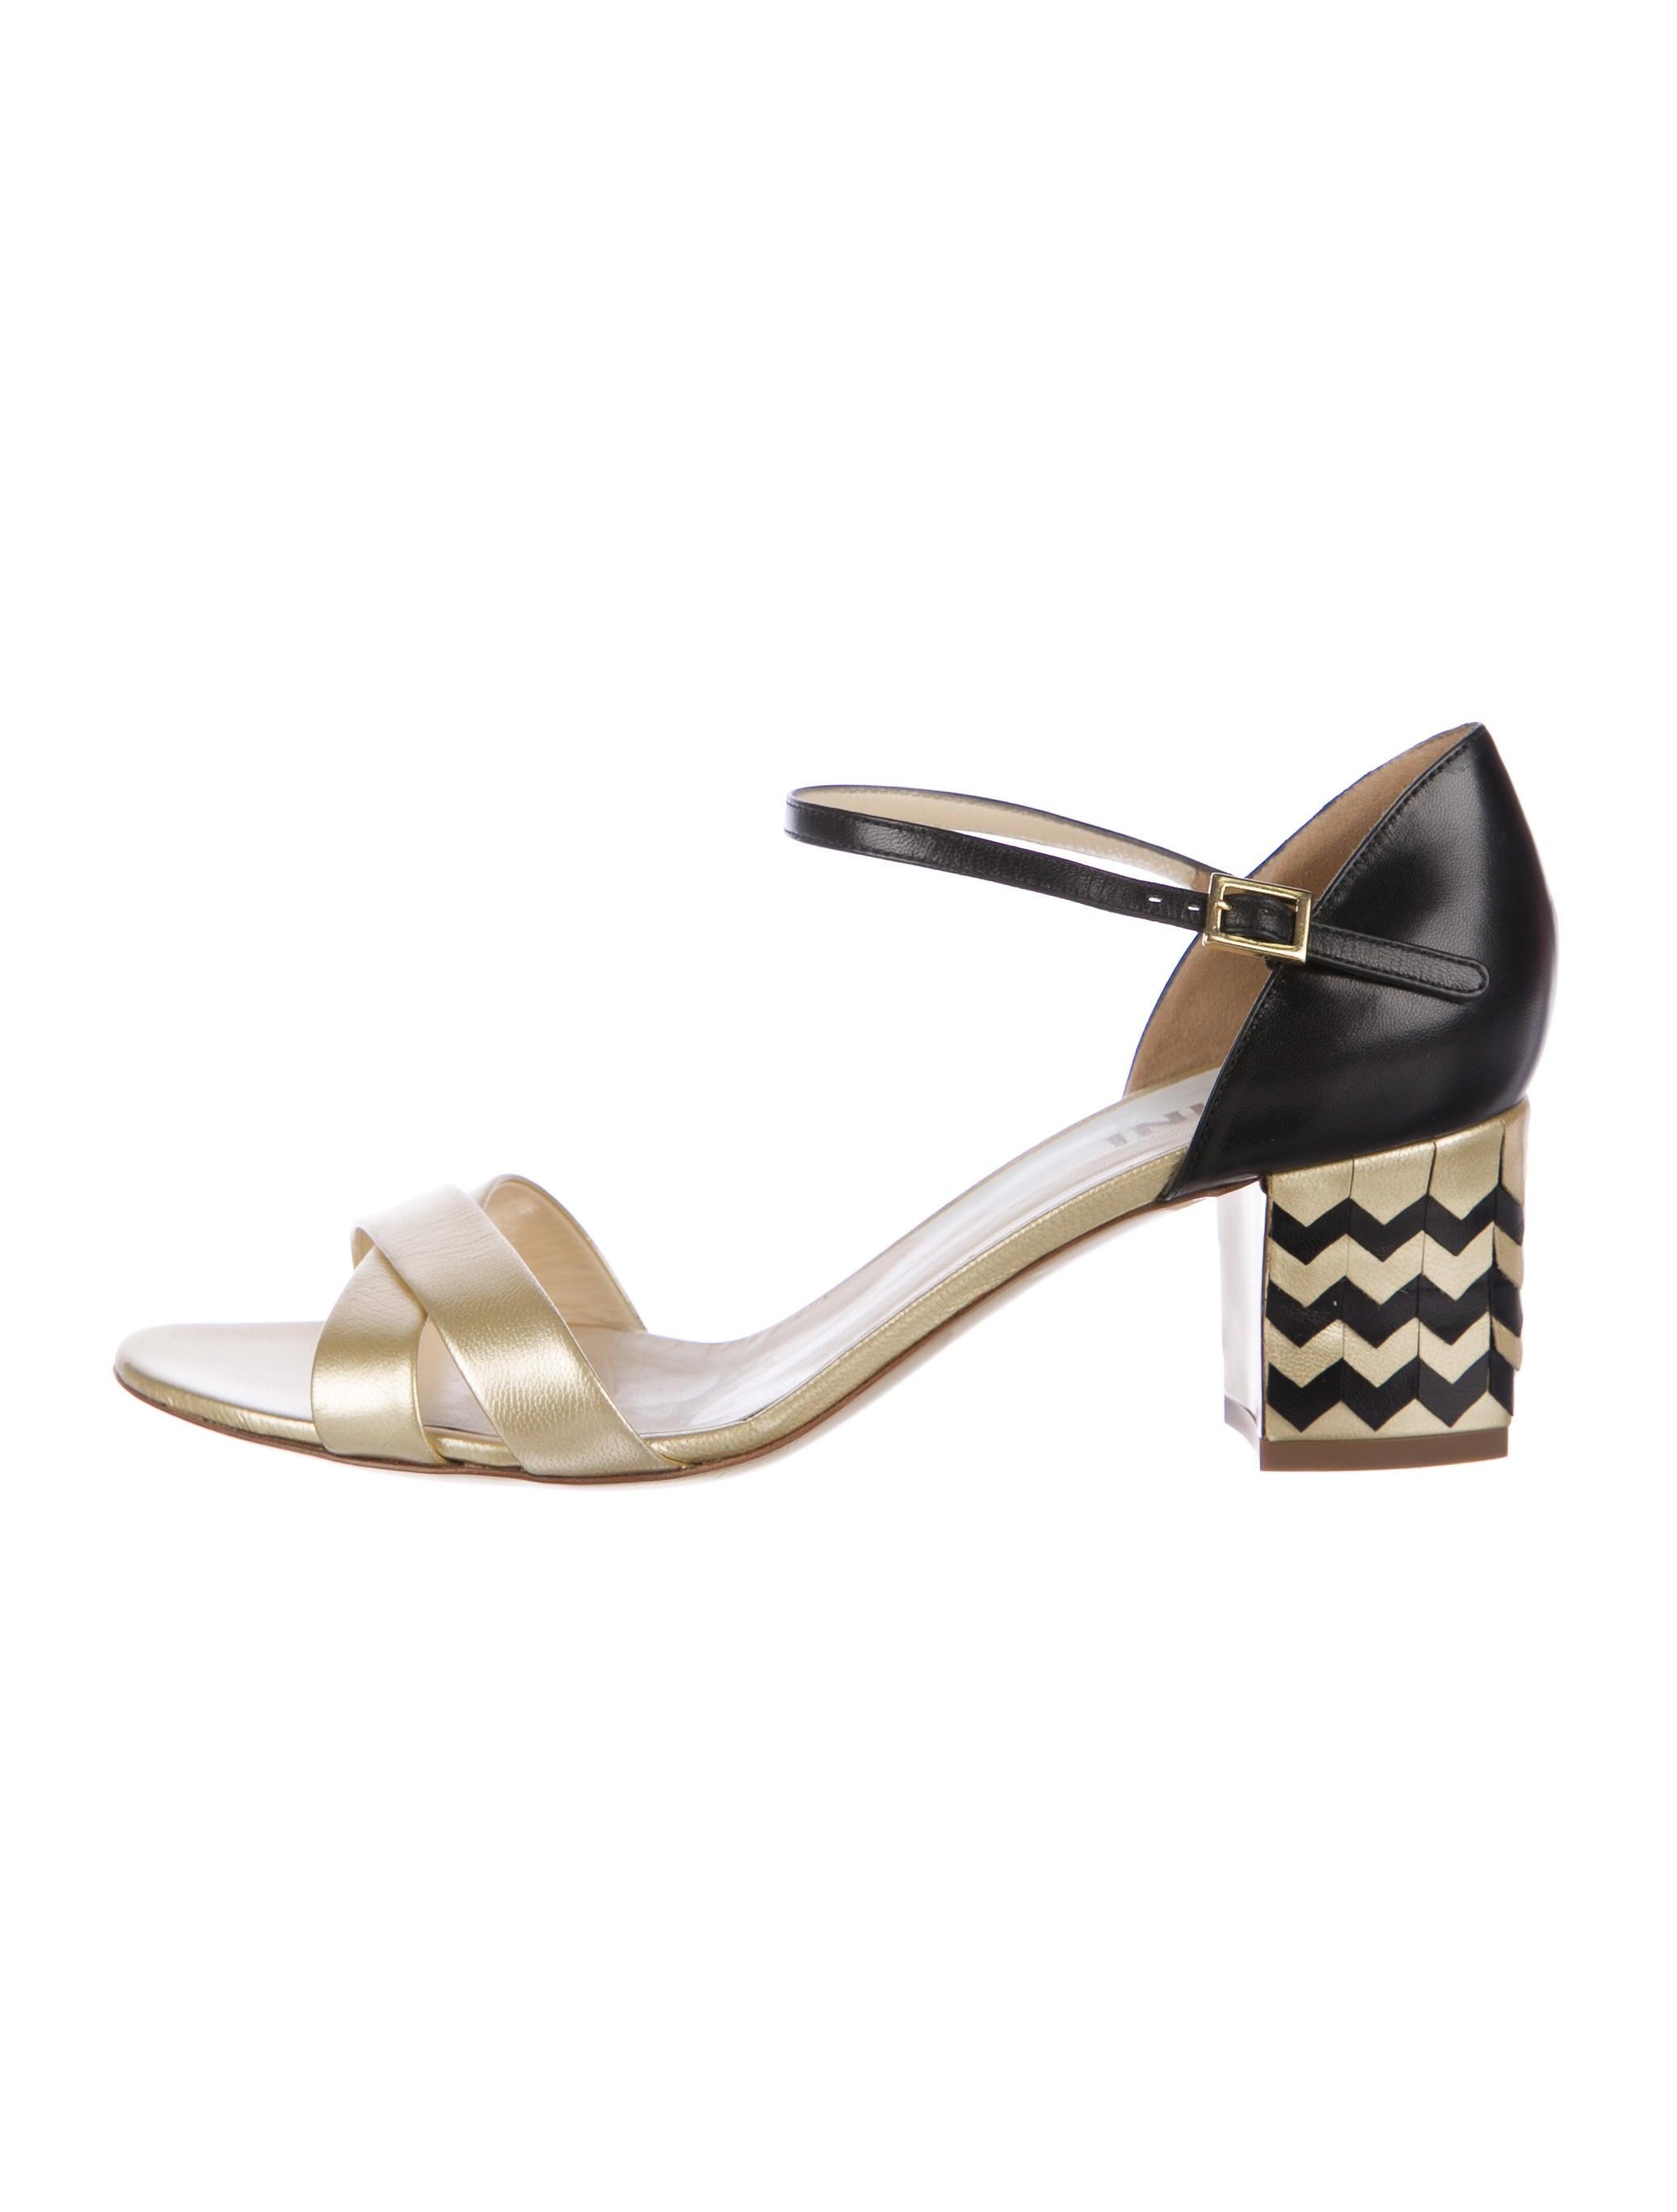 Pollini Metallic Chevron Sandals discount finishline buy cheap eastbay cheap sale Manchester uMhuJKc